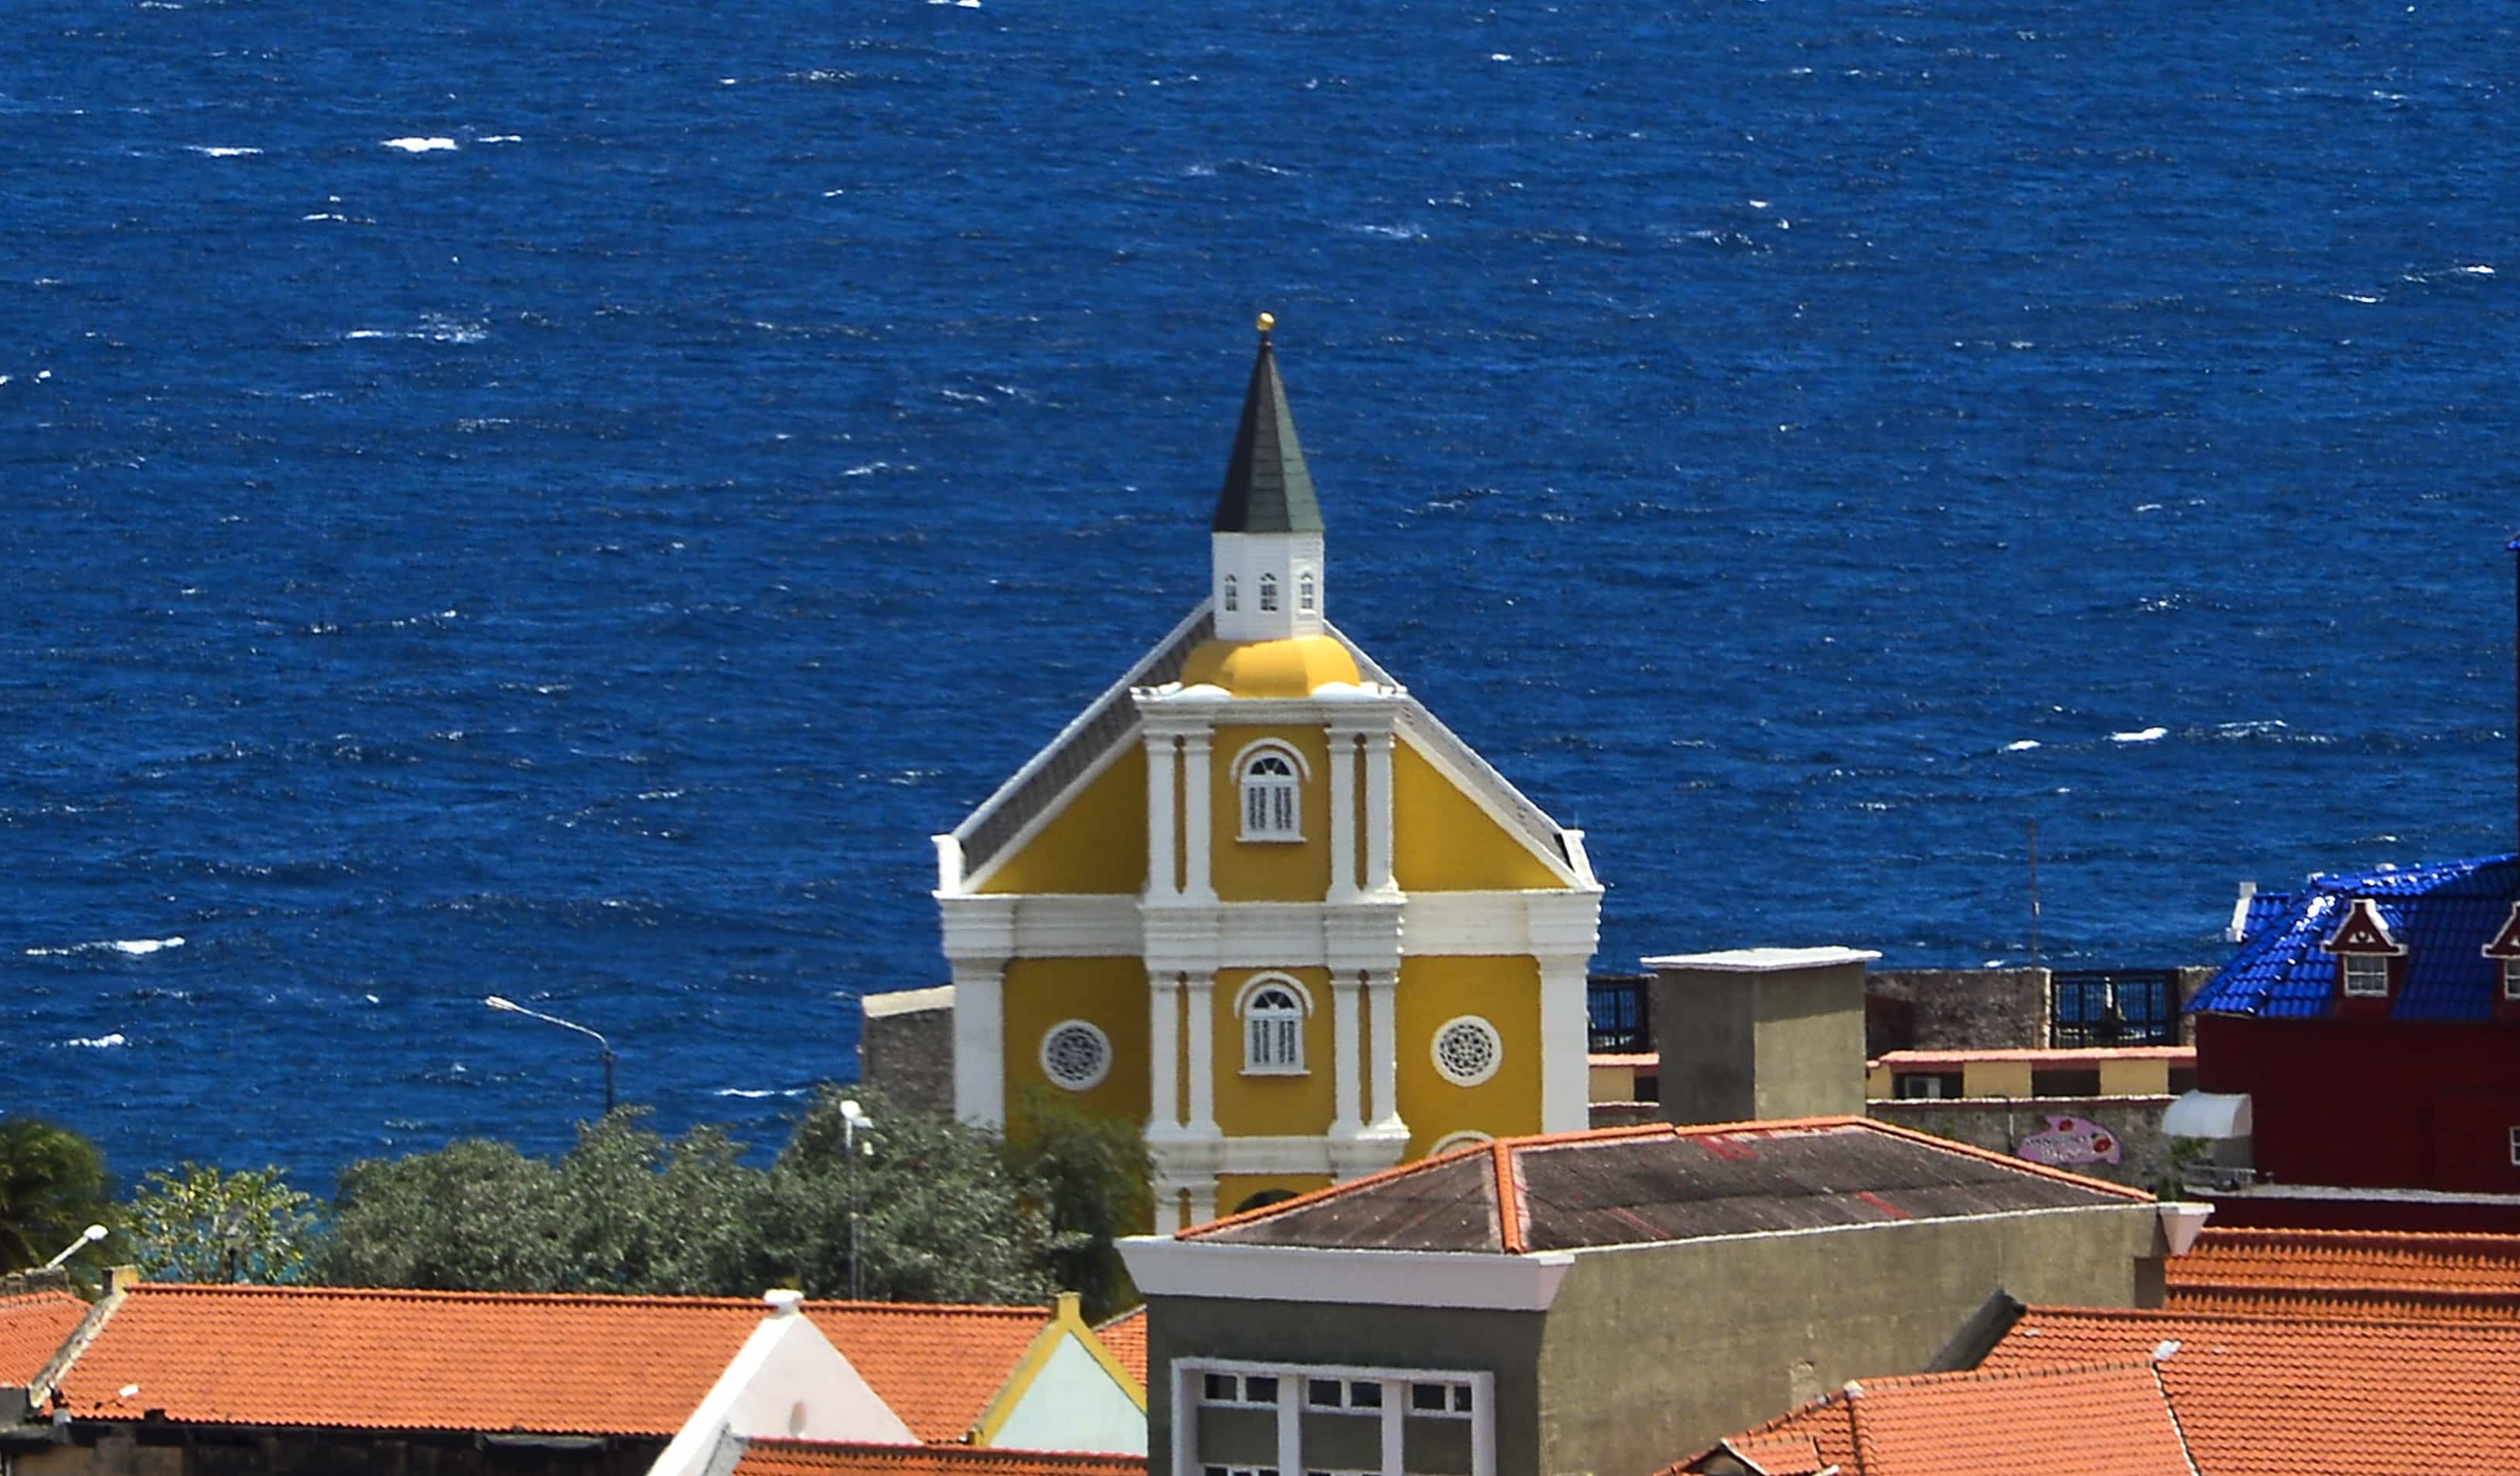 Turismo en Curaçao - Pulzo.com